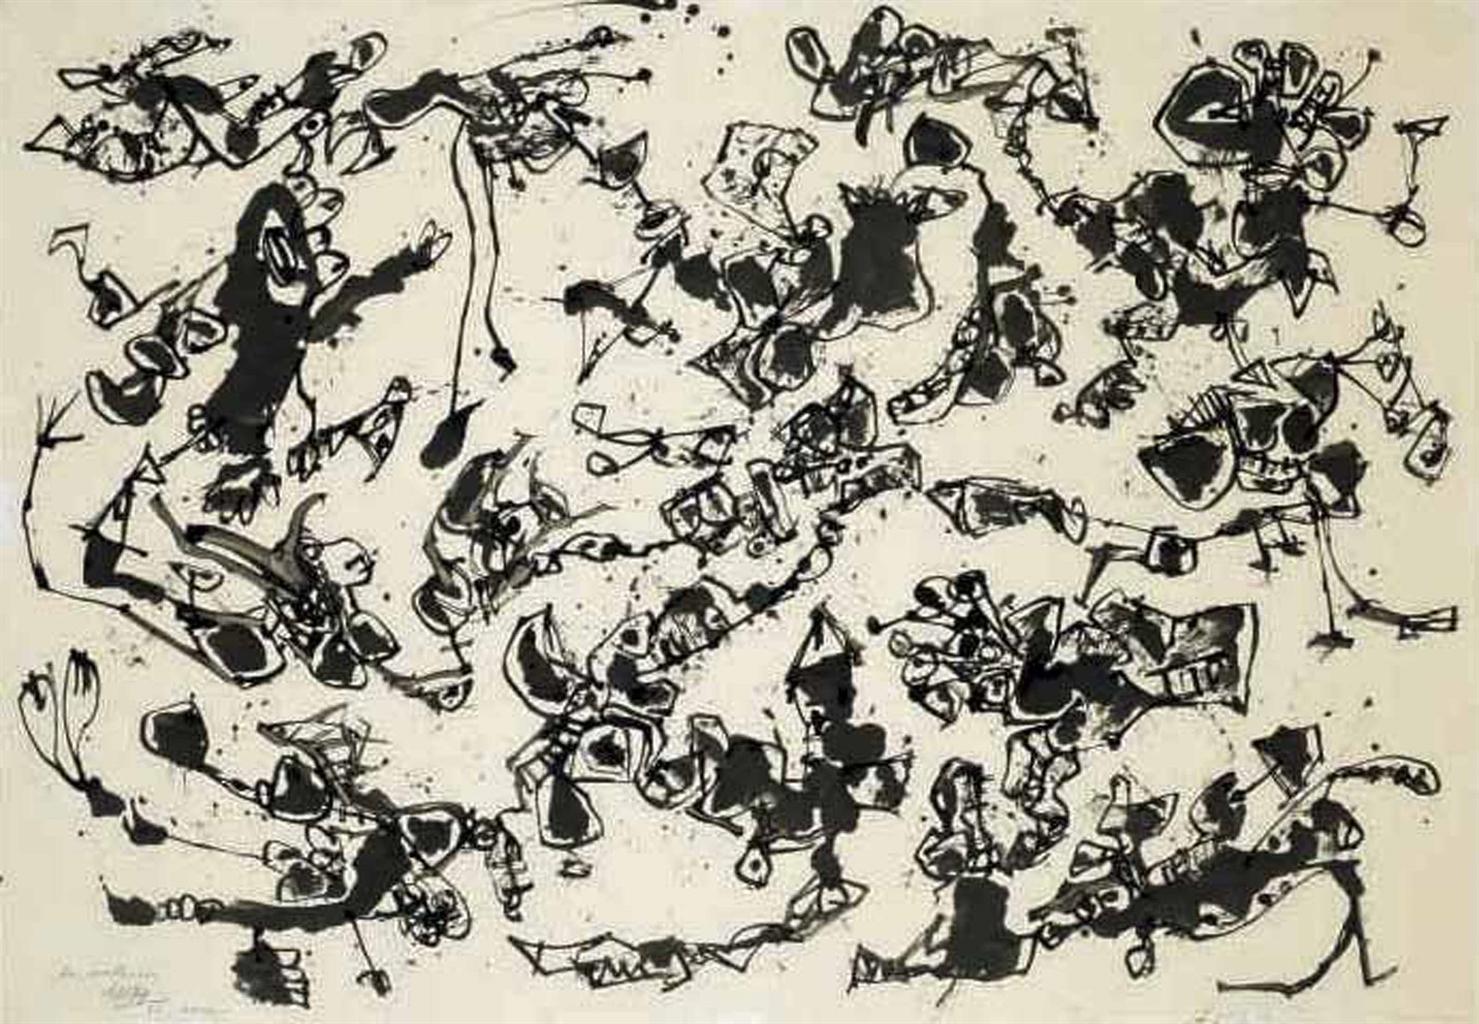 Antonio Saura-Mutacion 2-1961